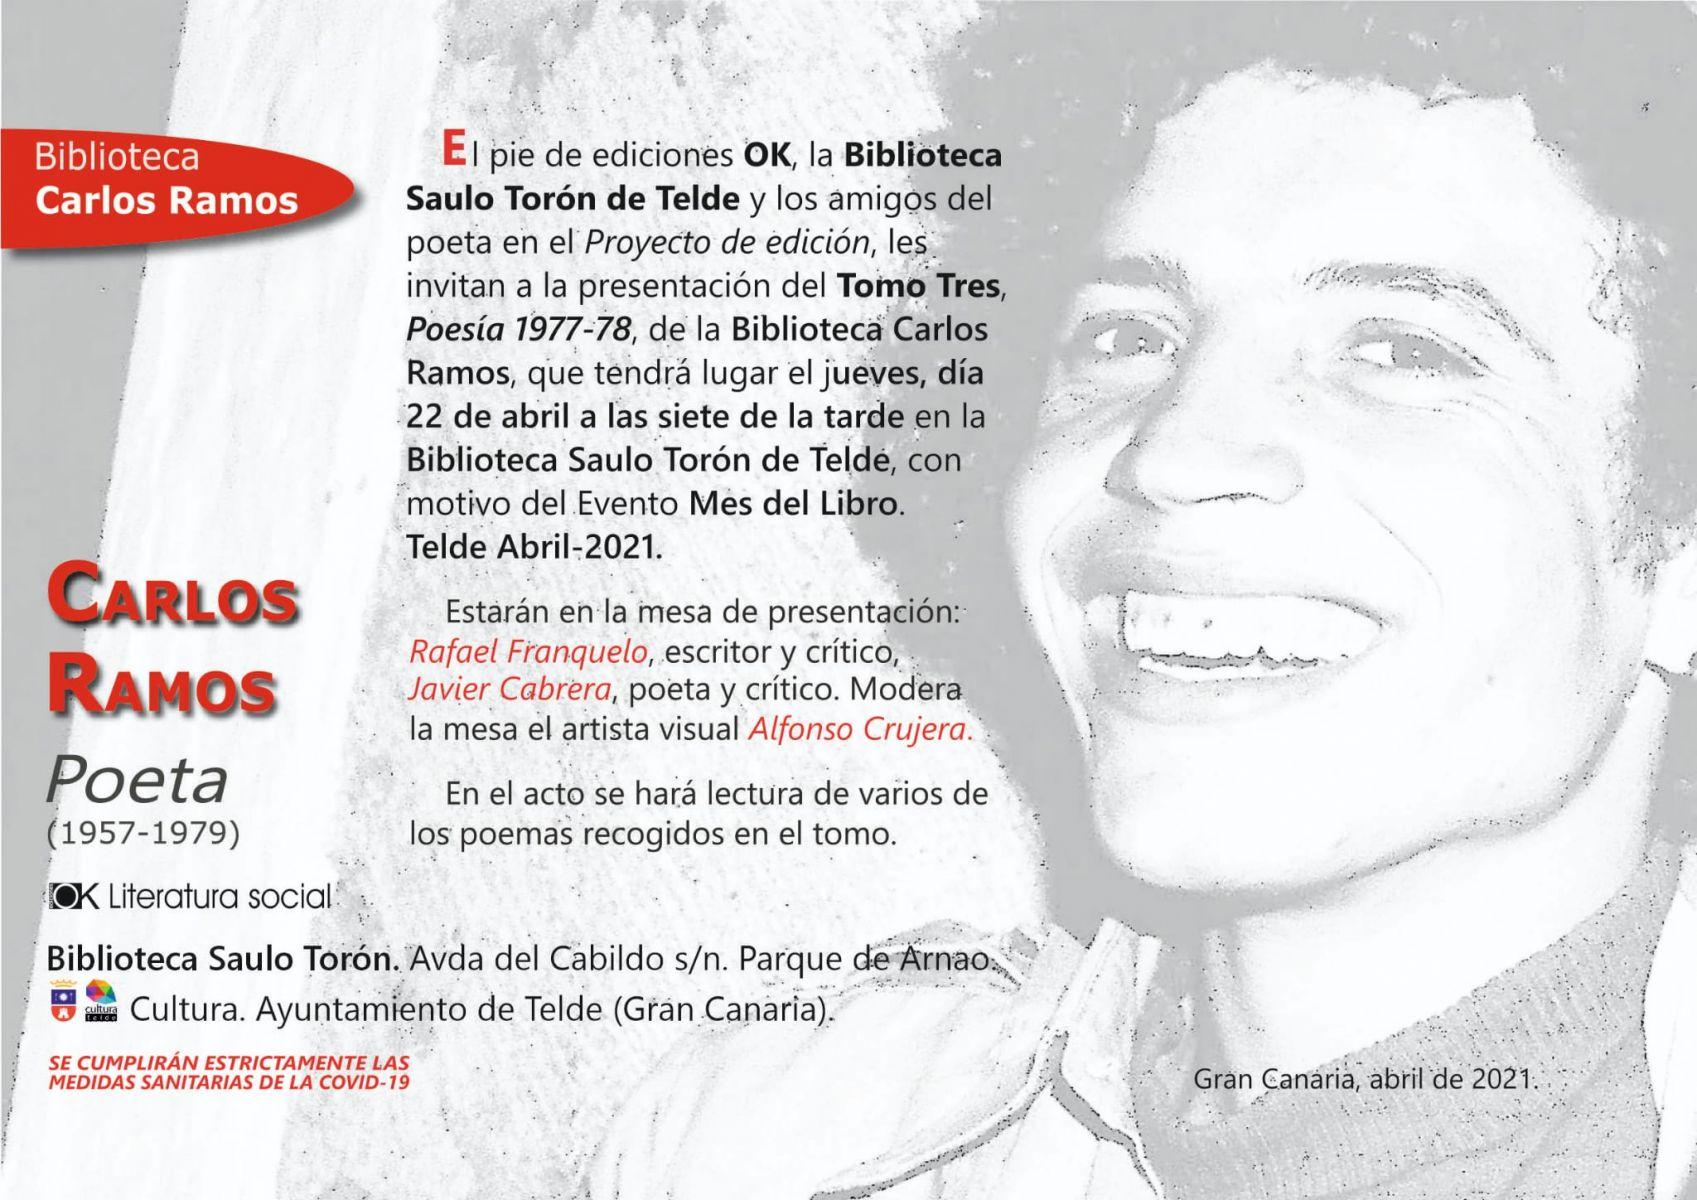 CARLOS-RAMOS